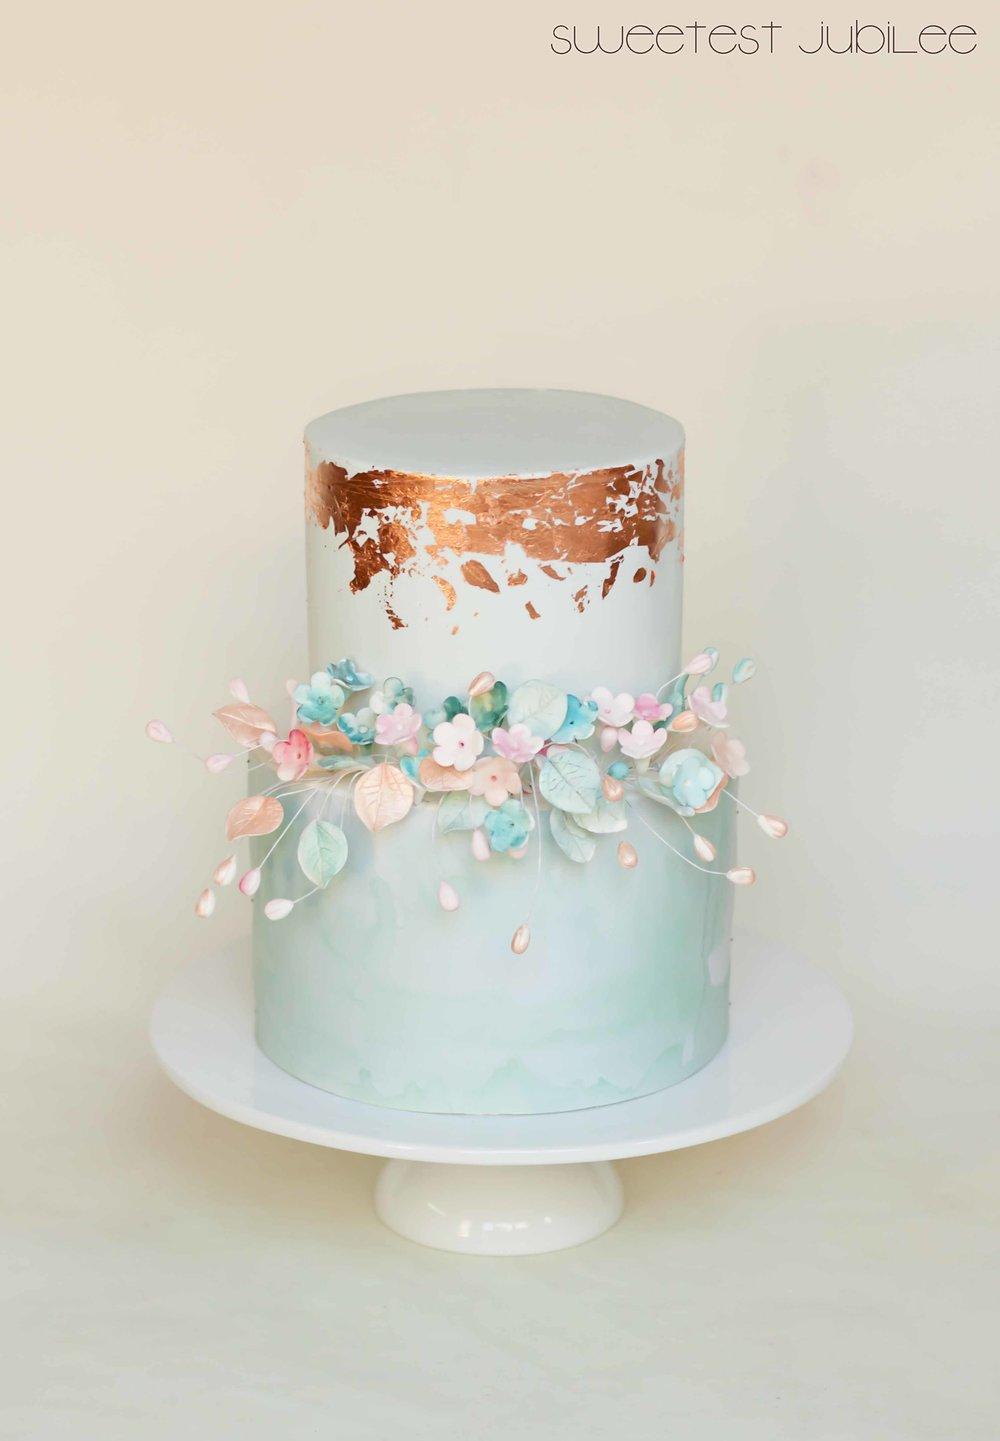 watercolour cake.jpg